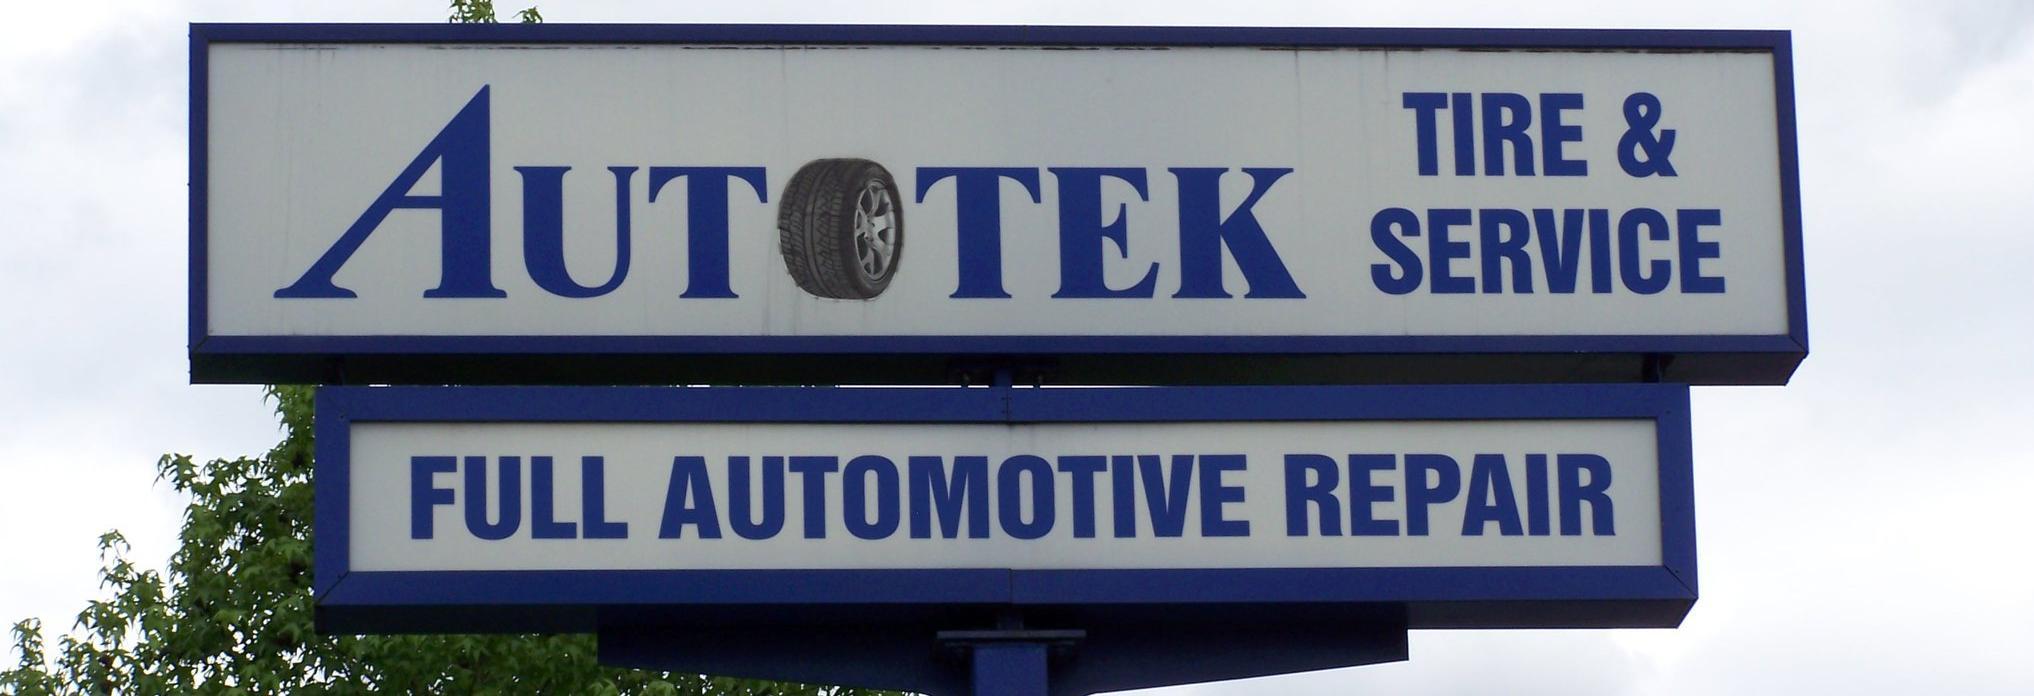 Autotek Tire & Service - Full Automotive Repair - Kent, WA